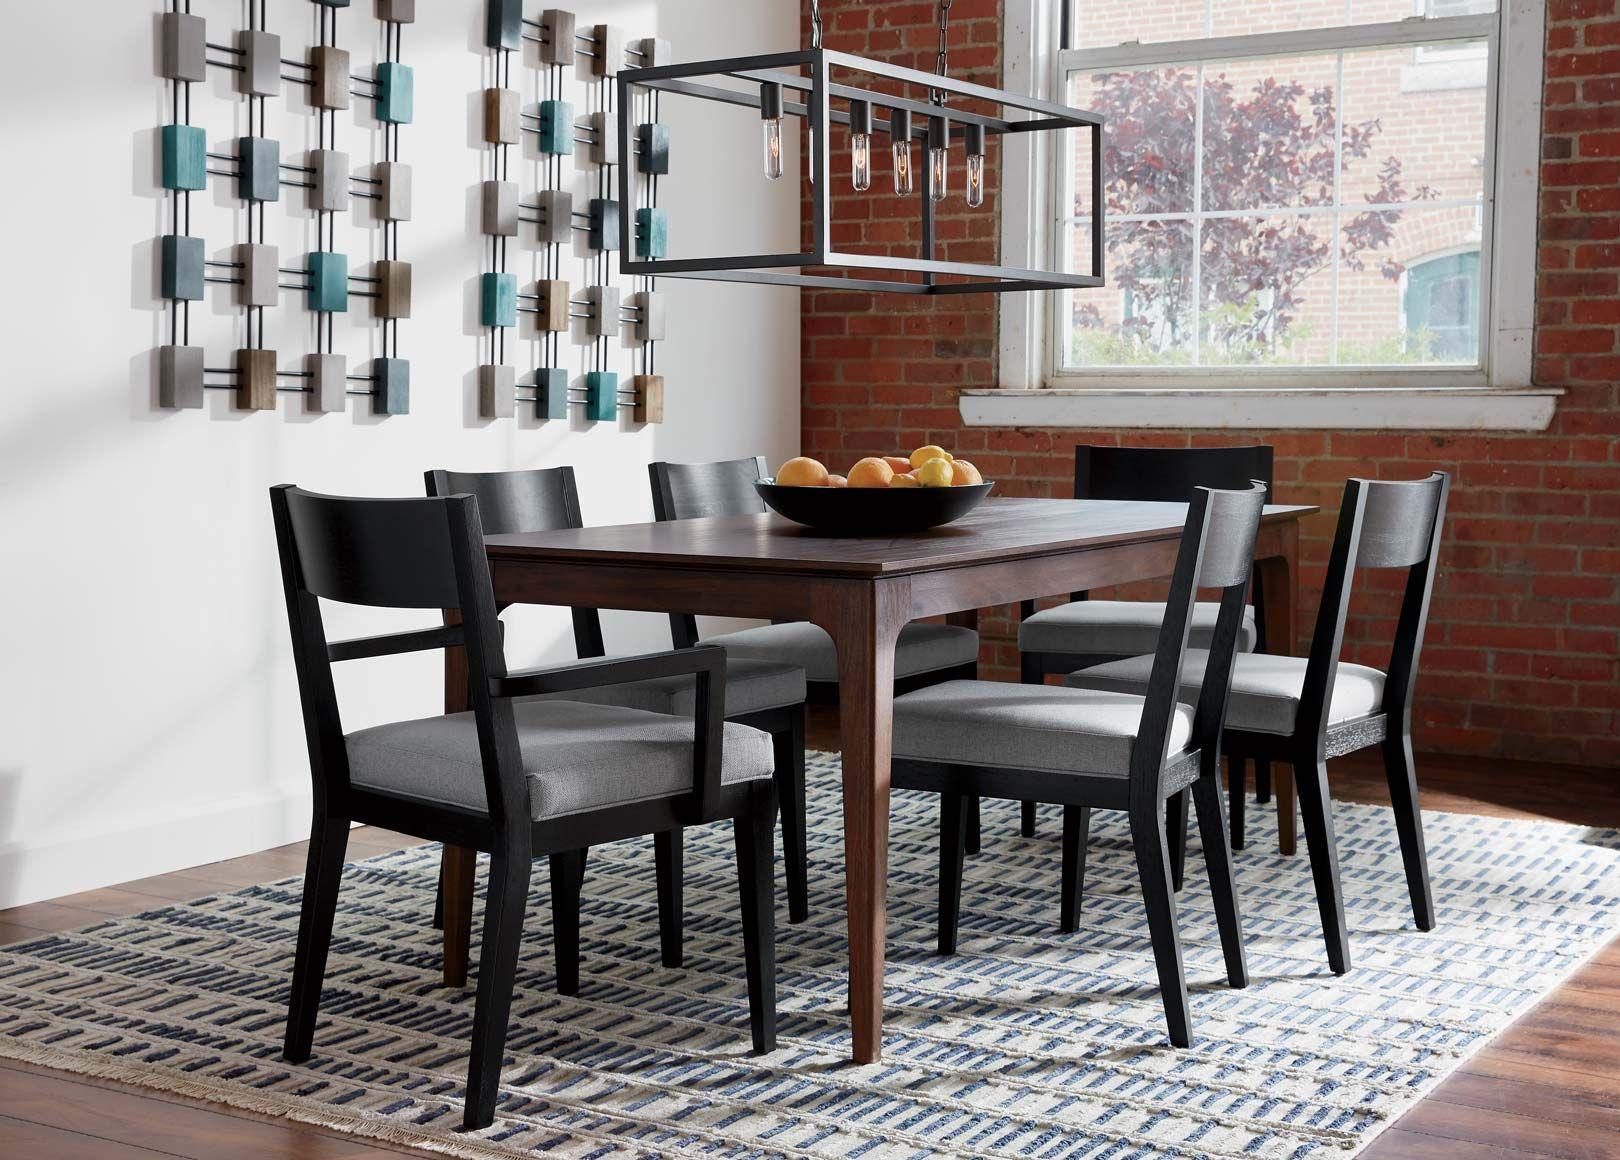 Blue-Gray Dining Room Inspiration | Ethan Allen Design ...